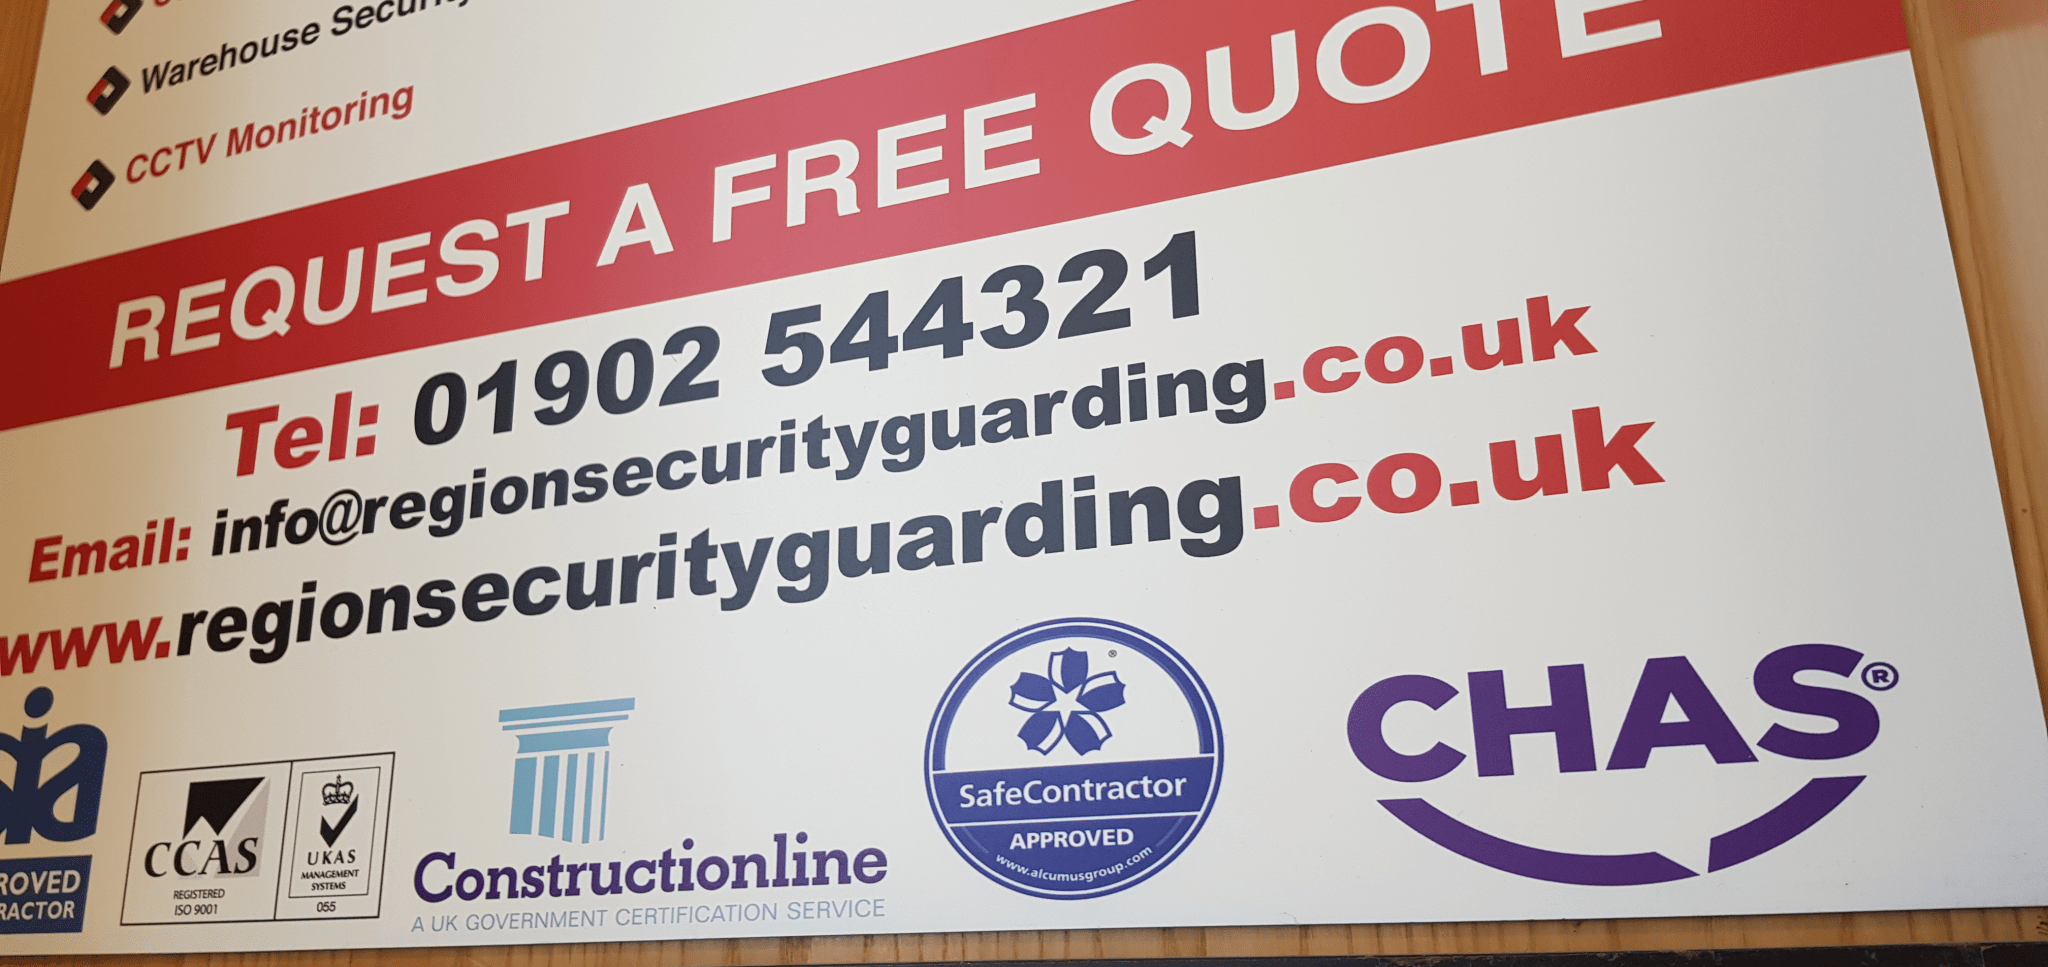 Security, Company, Companies, Guards, Services, Birmingham, Manchester, Wolverhampton